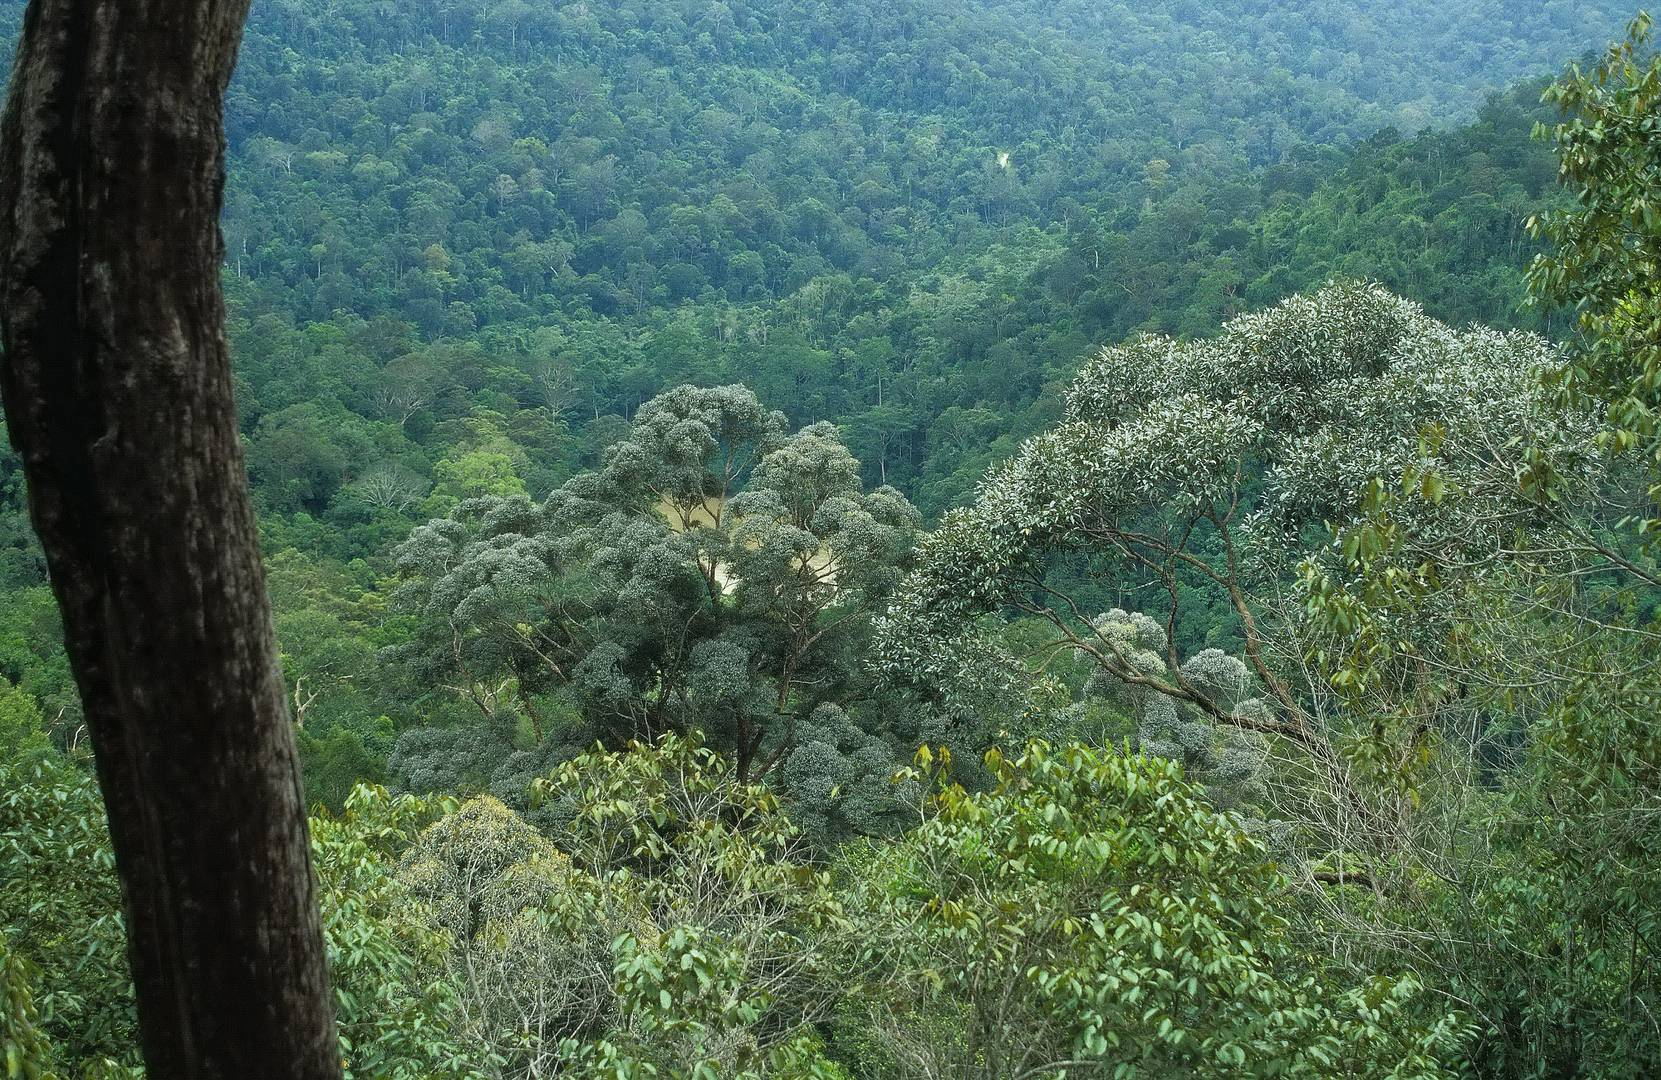 Taman Negara Bukit Teresek